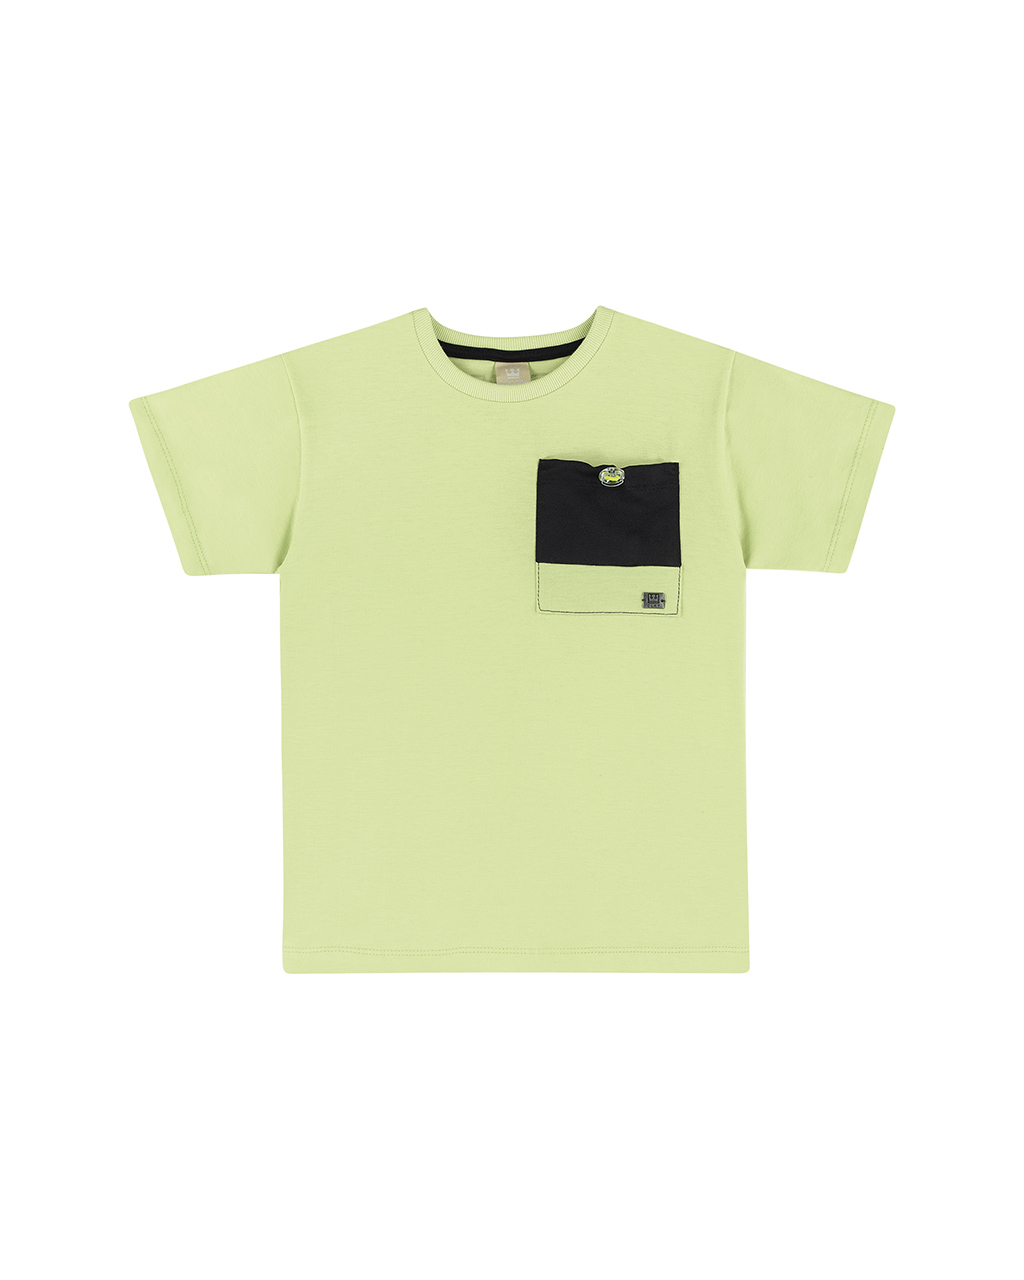 Camiseta Infantil com Bolso Verde Coloritta